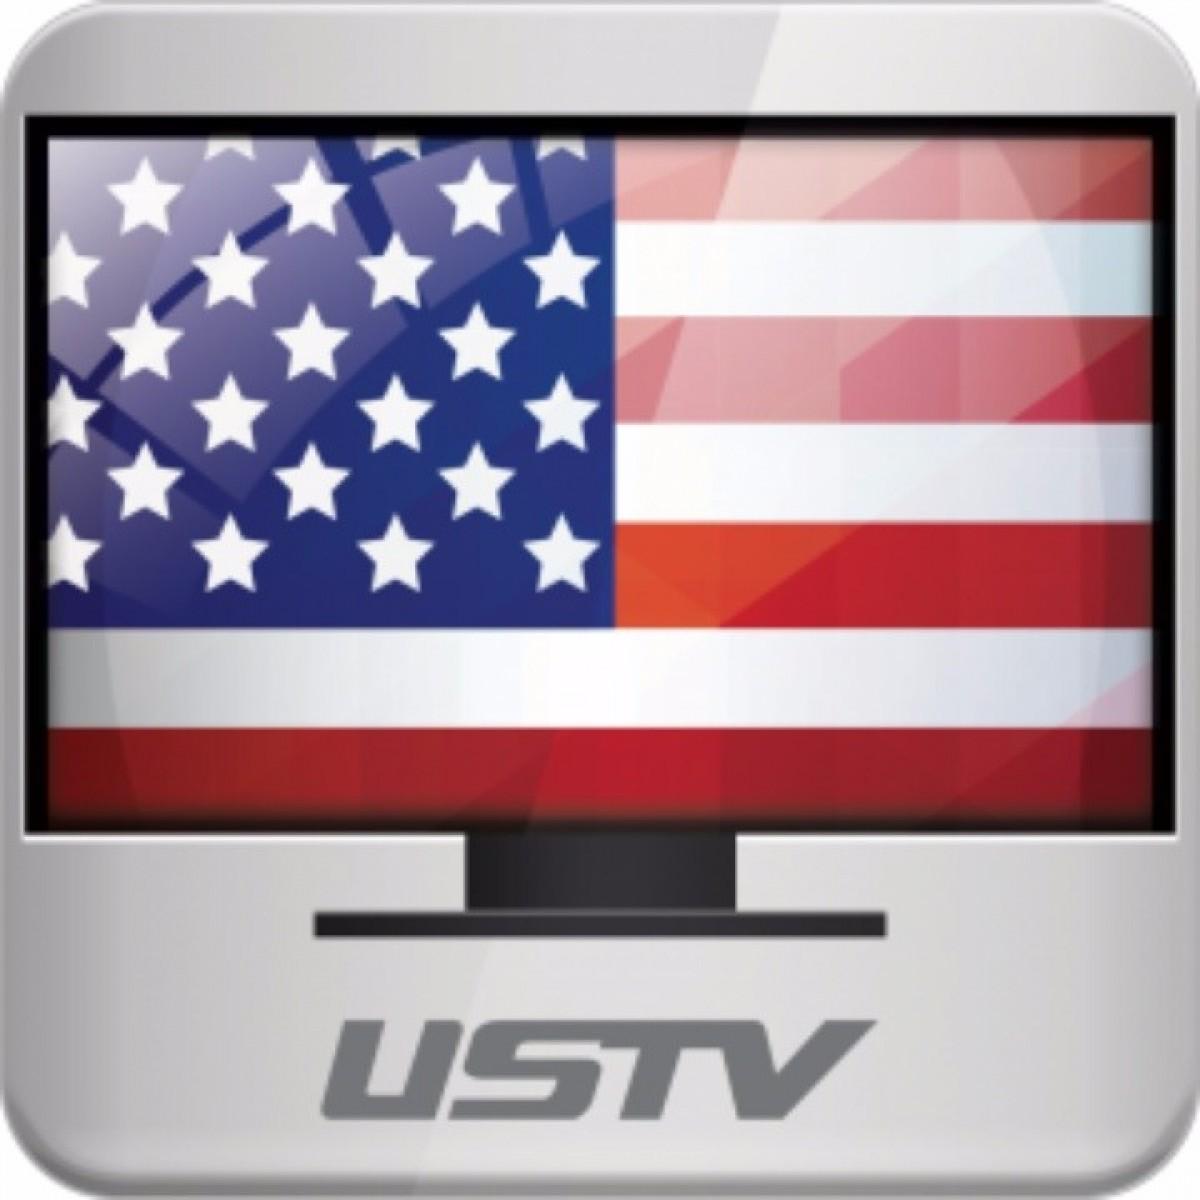 USTV Pro v7.0 (Premium) (Unlocked) + (Versions) (23 MB)